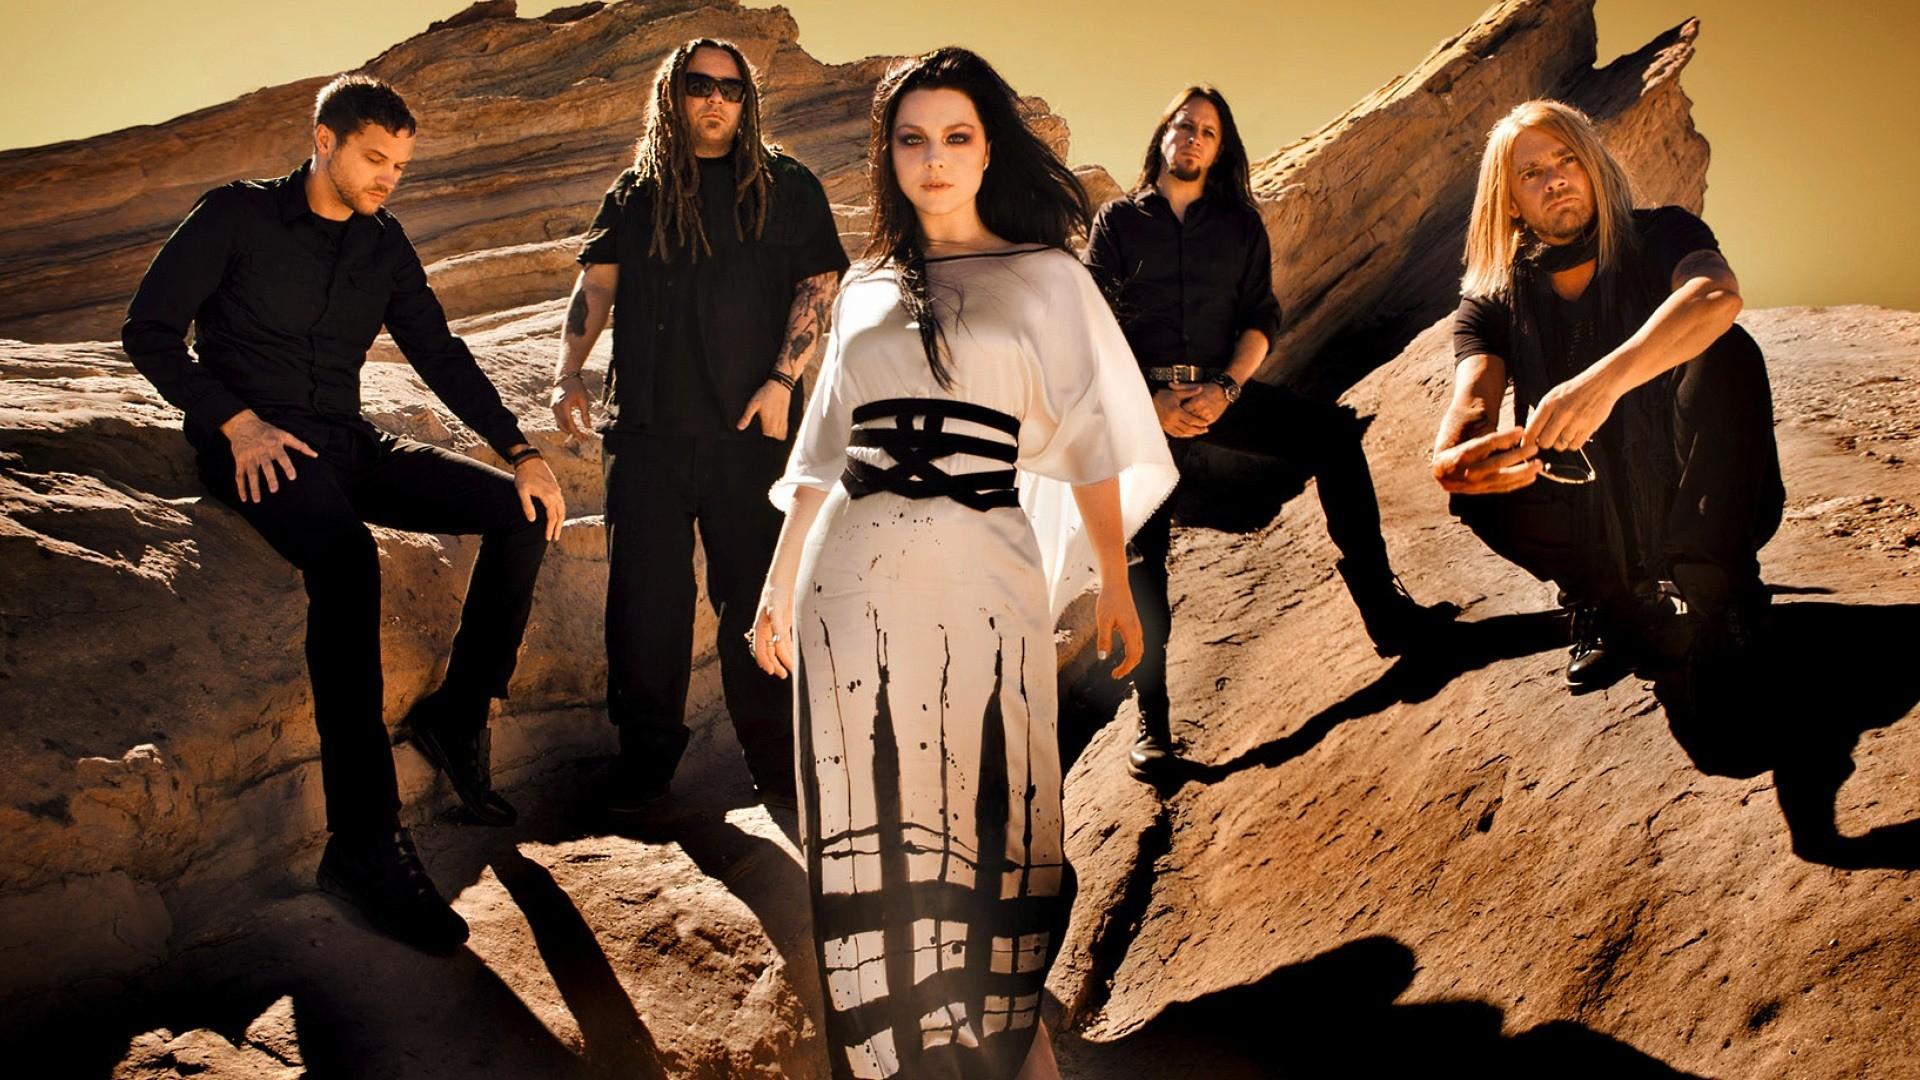 Evanescence backdrop wallpaper